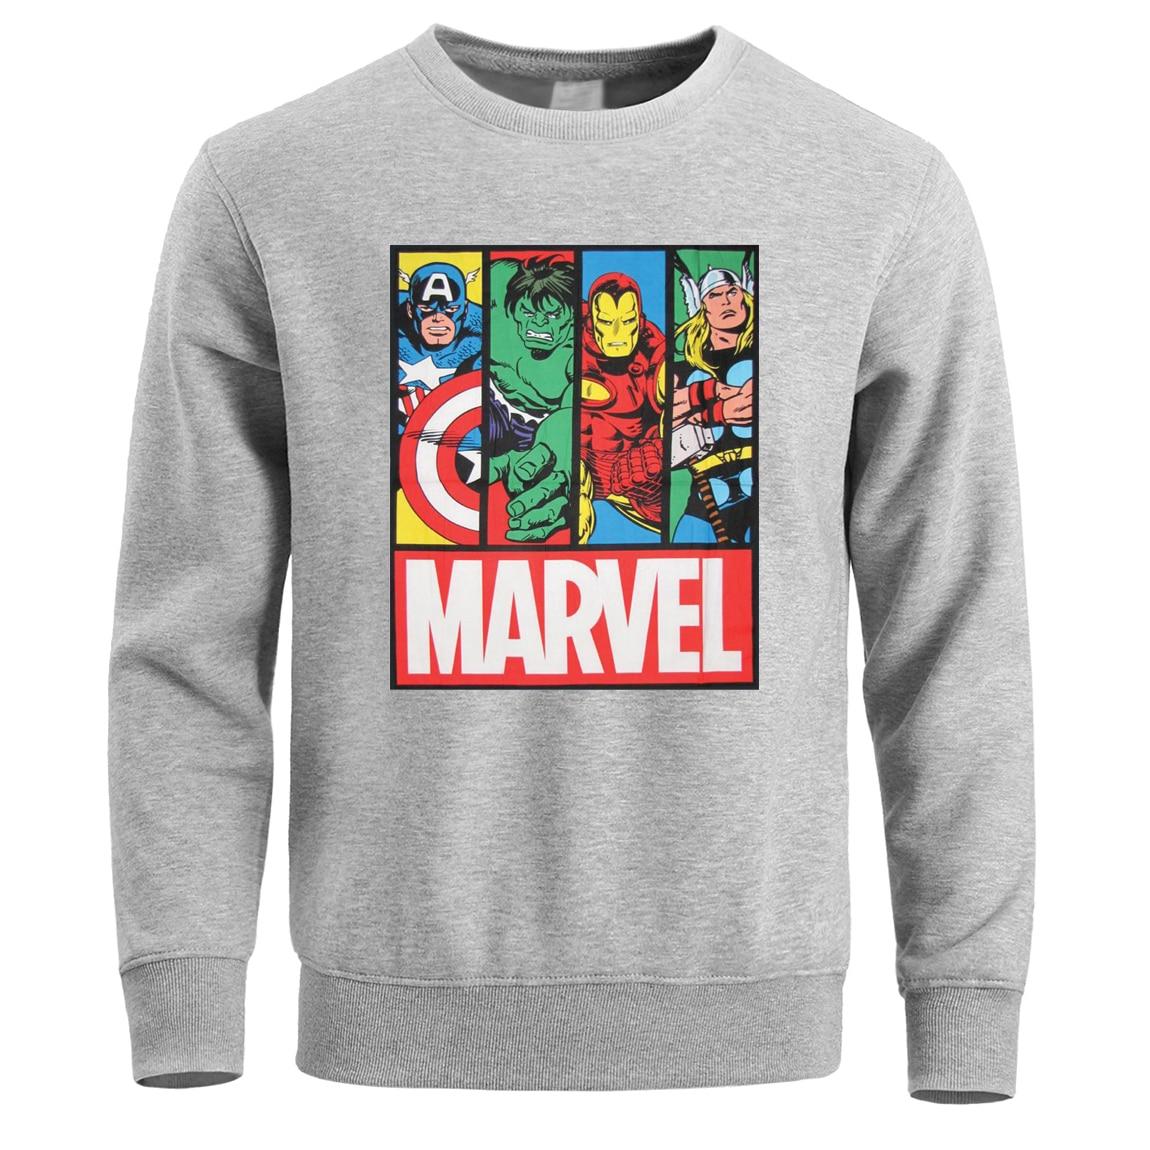 Marvel Hoodies Sweatshirt Thor Hulk Superman Iron Man Superhero Hoodie Men Pullover Sweatshirts Fleece Warm Super Hero Crewneck